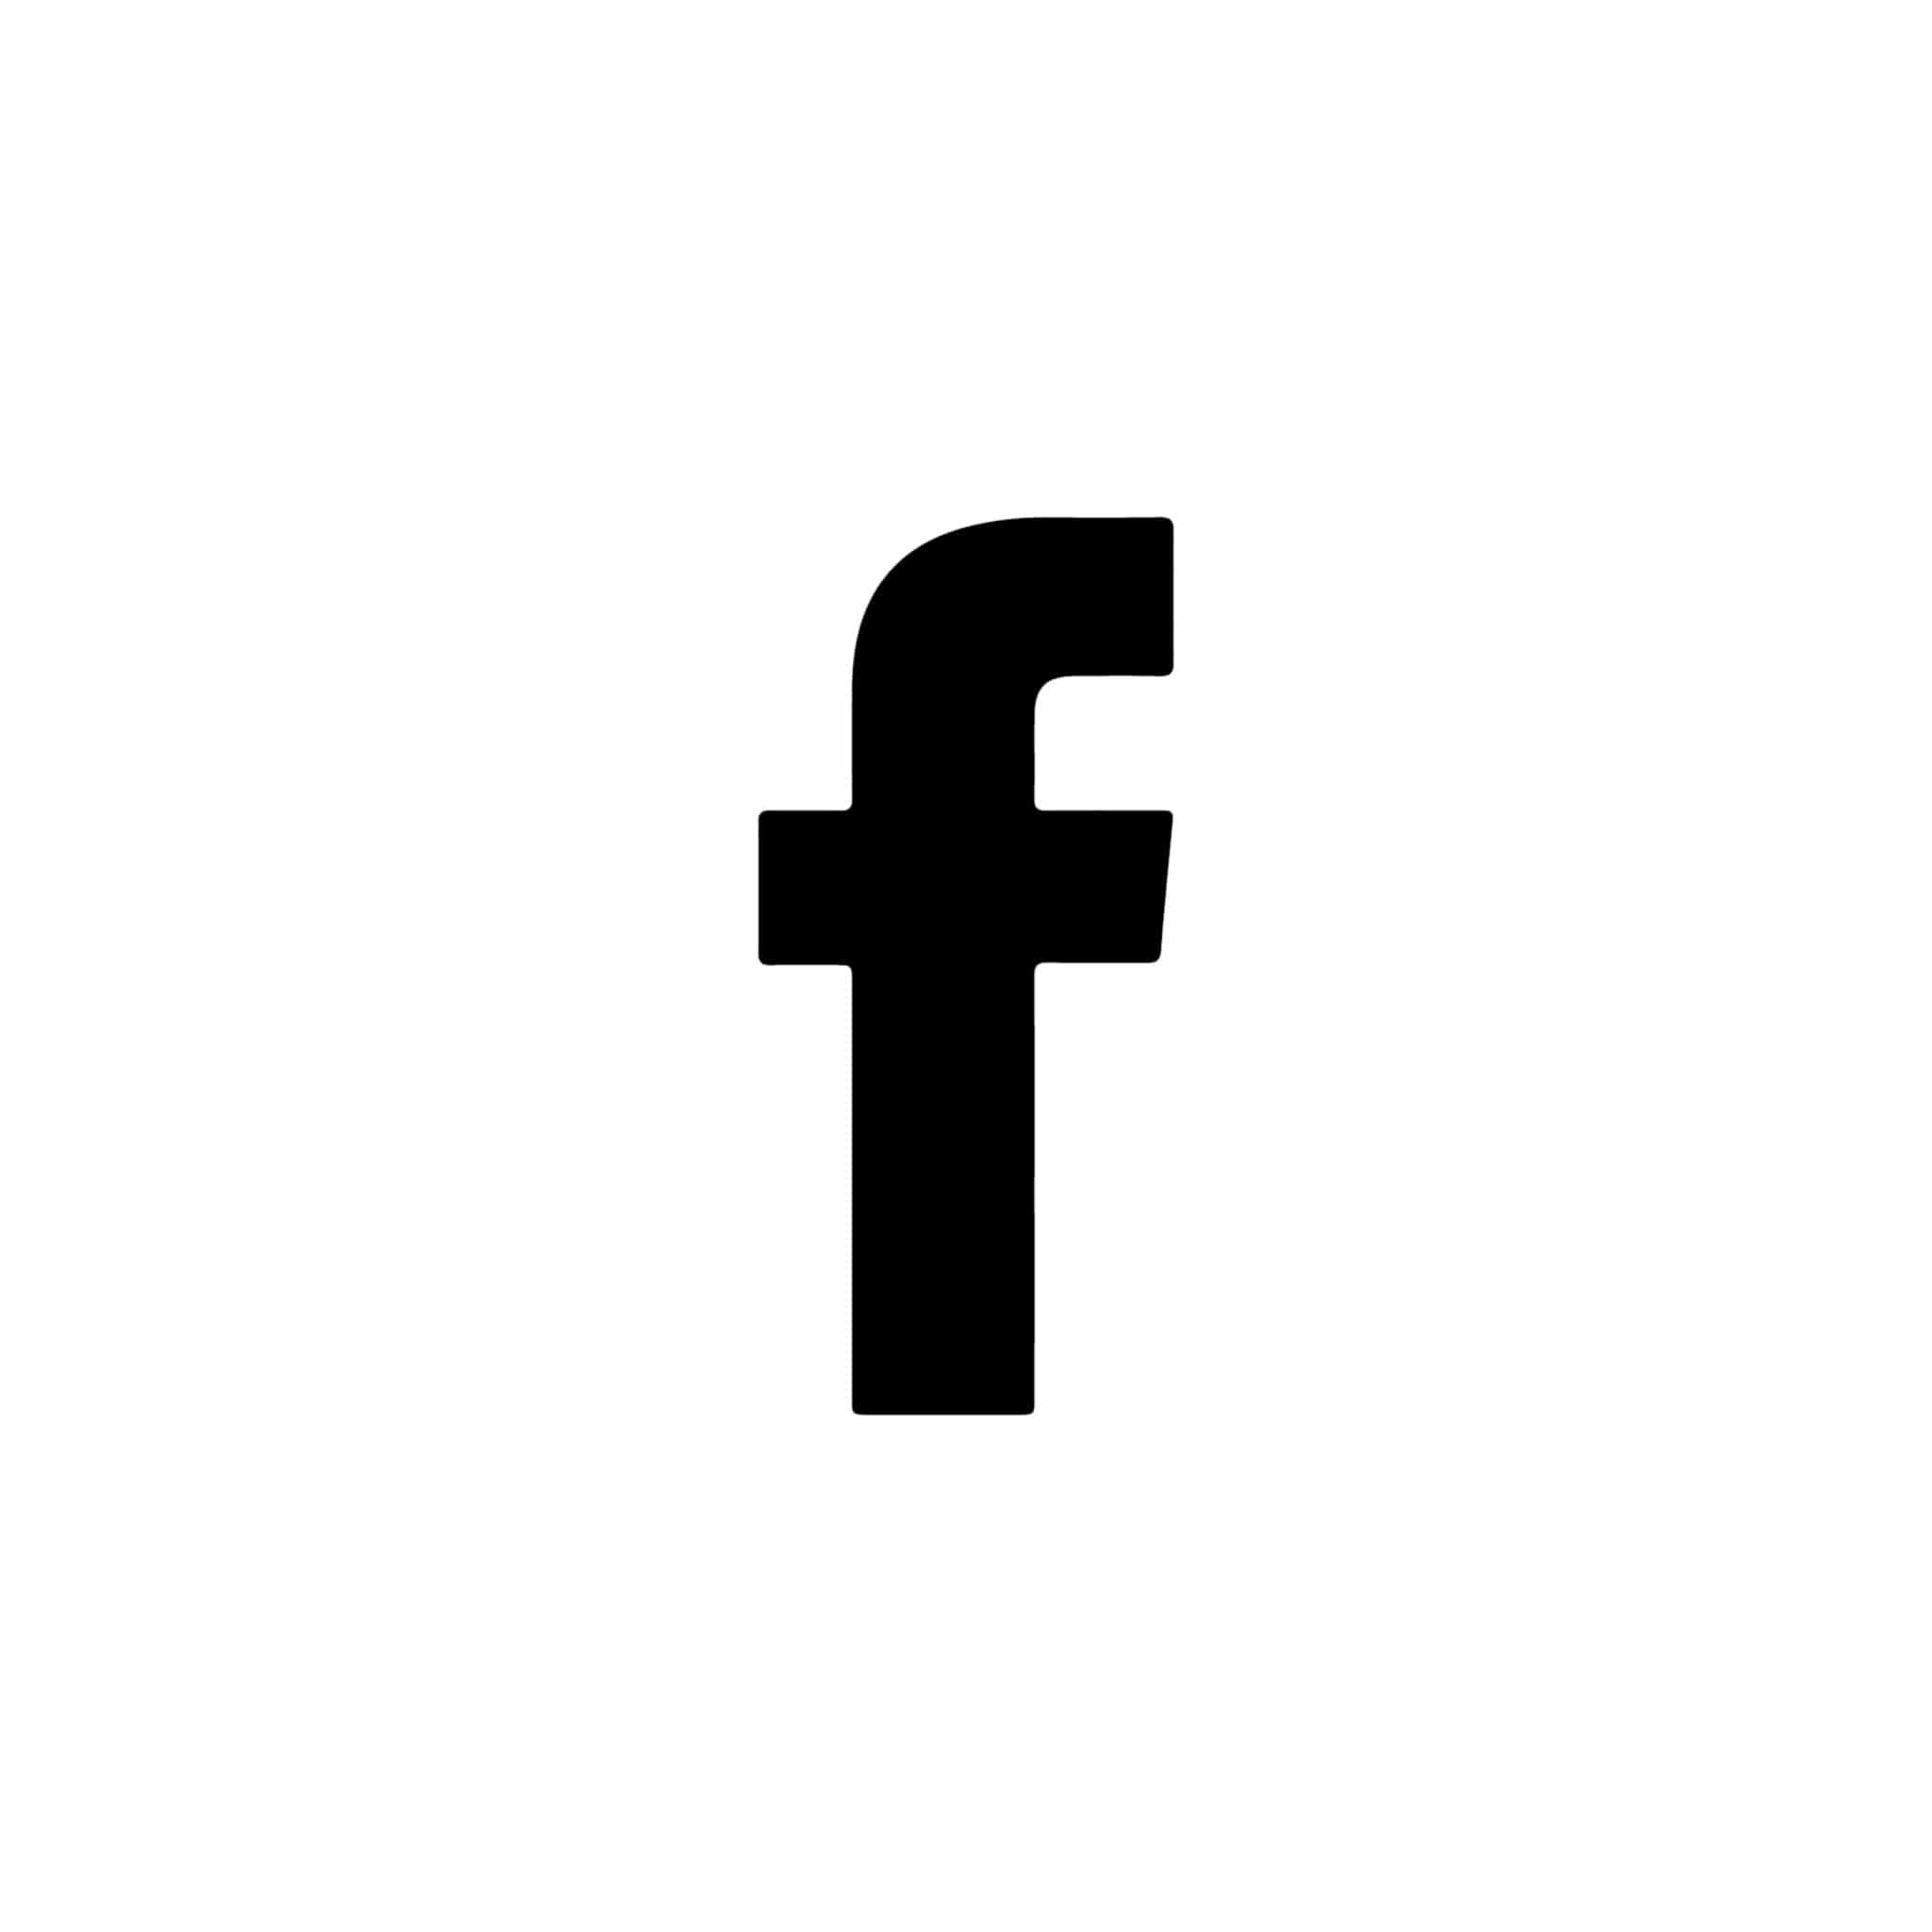 Heirloom Grove on Facebook